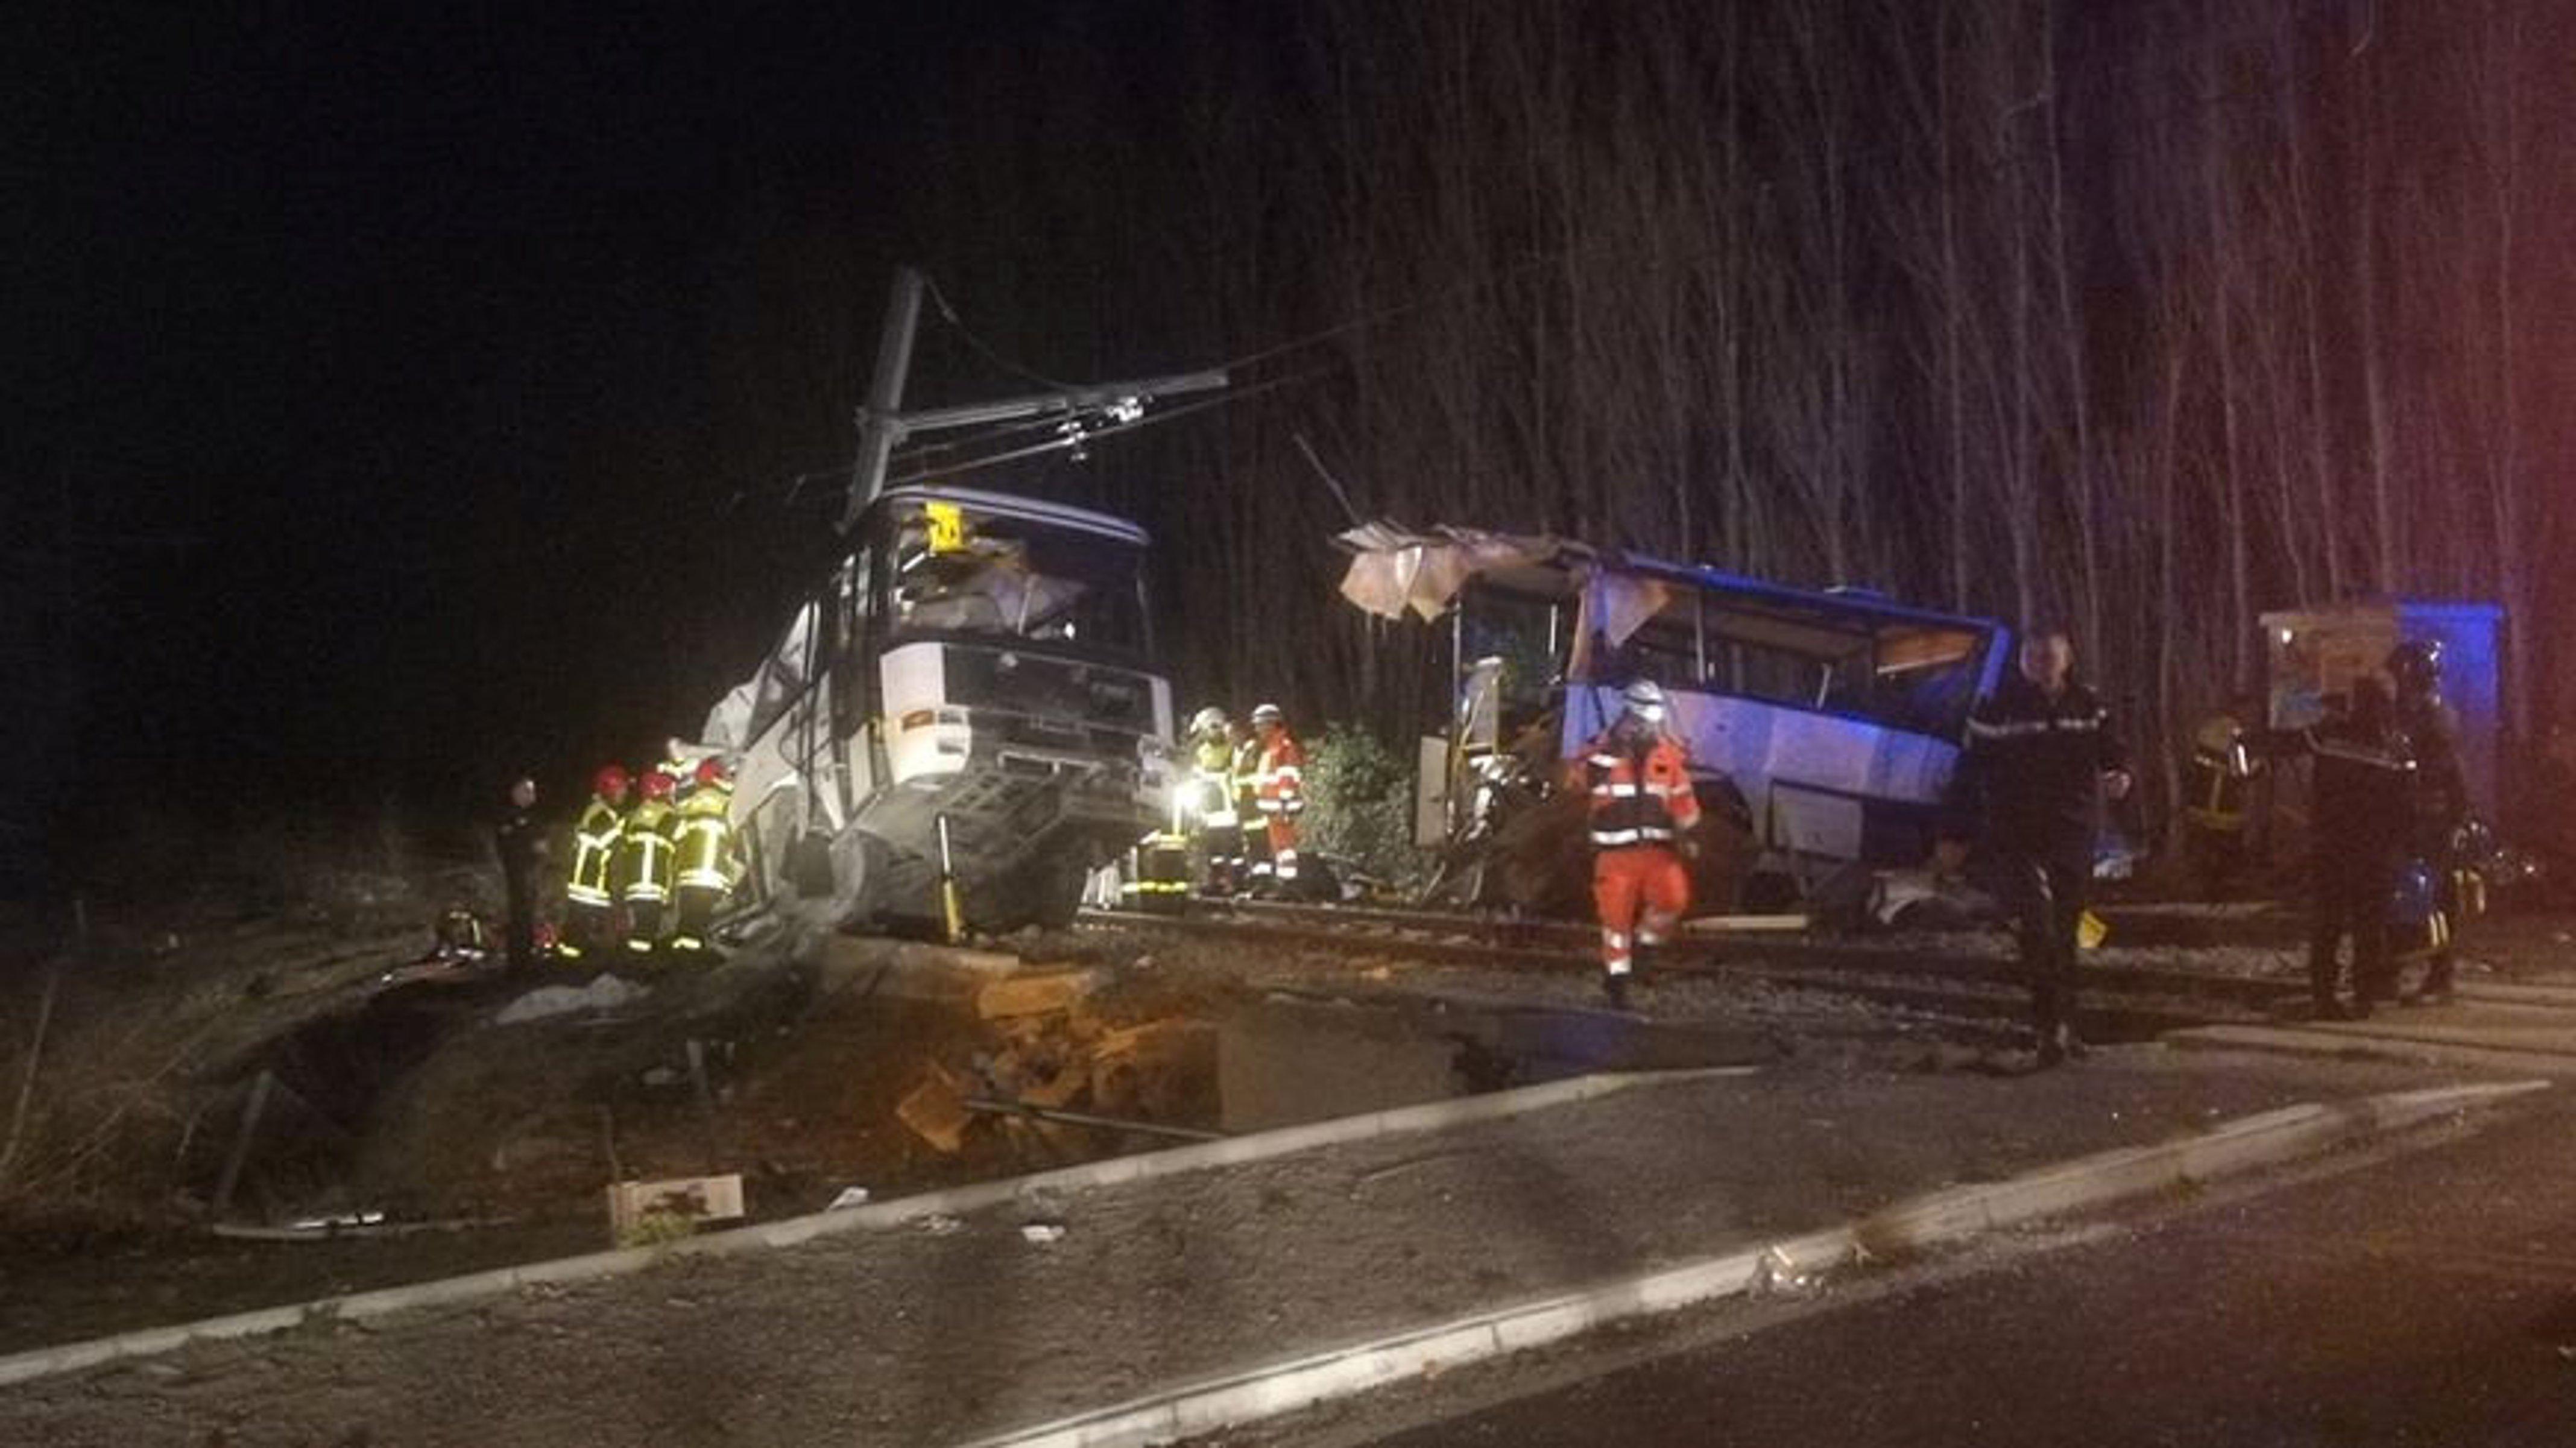 Accident Autobus Millars ACNJPG